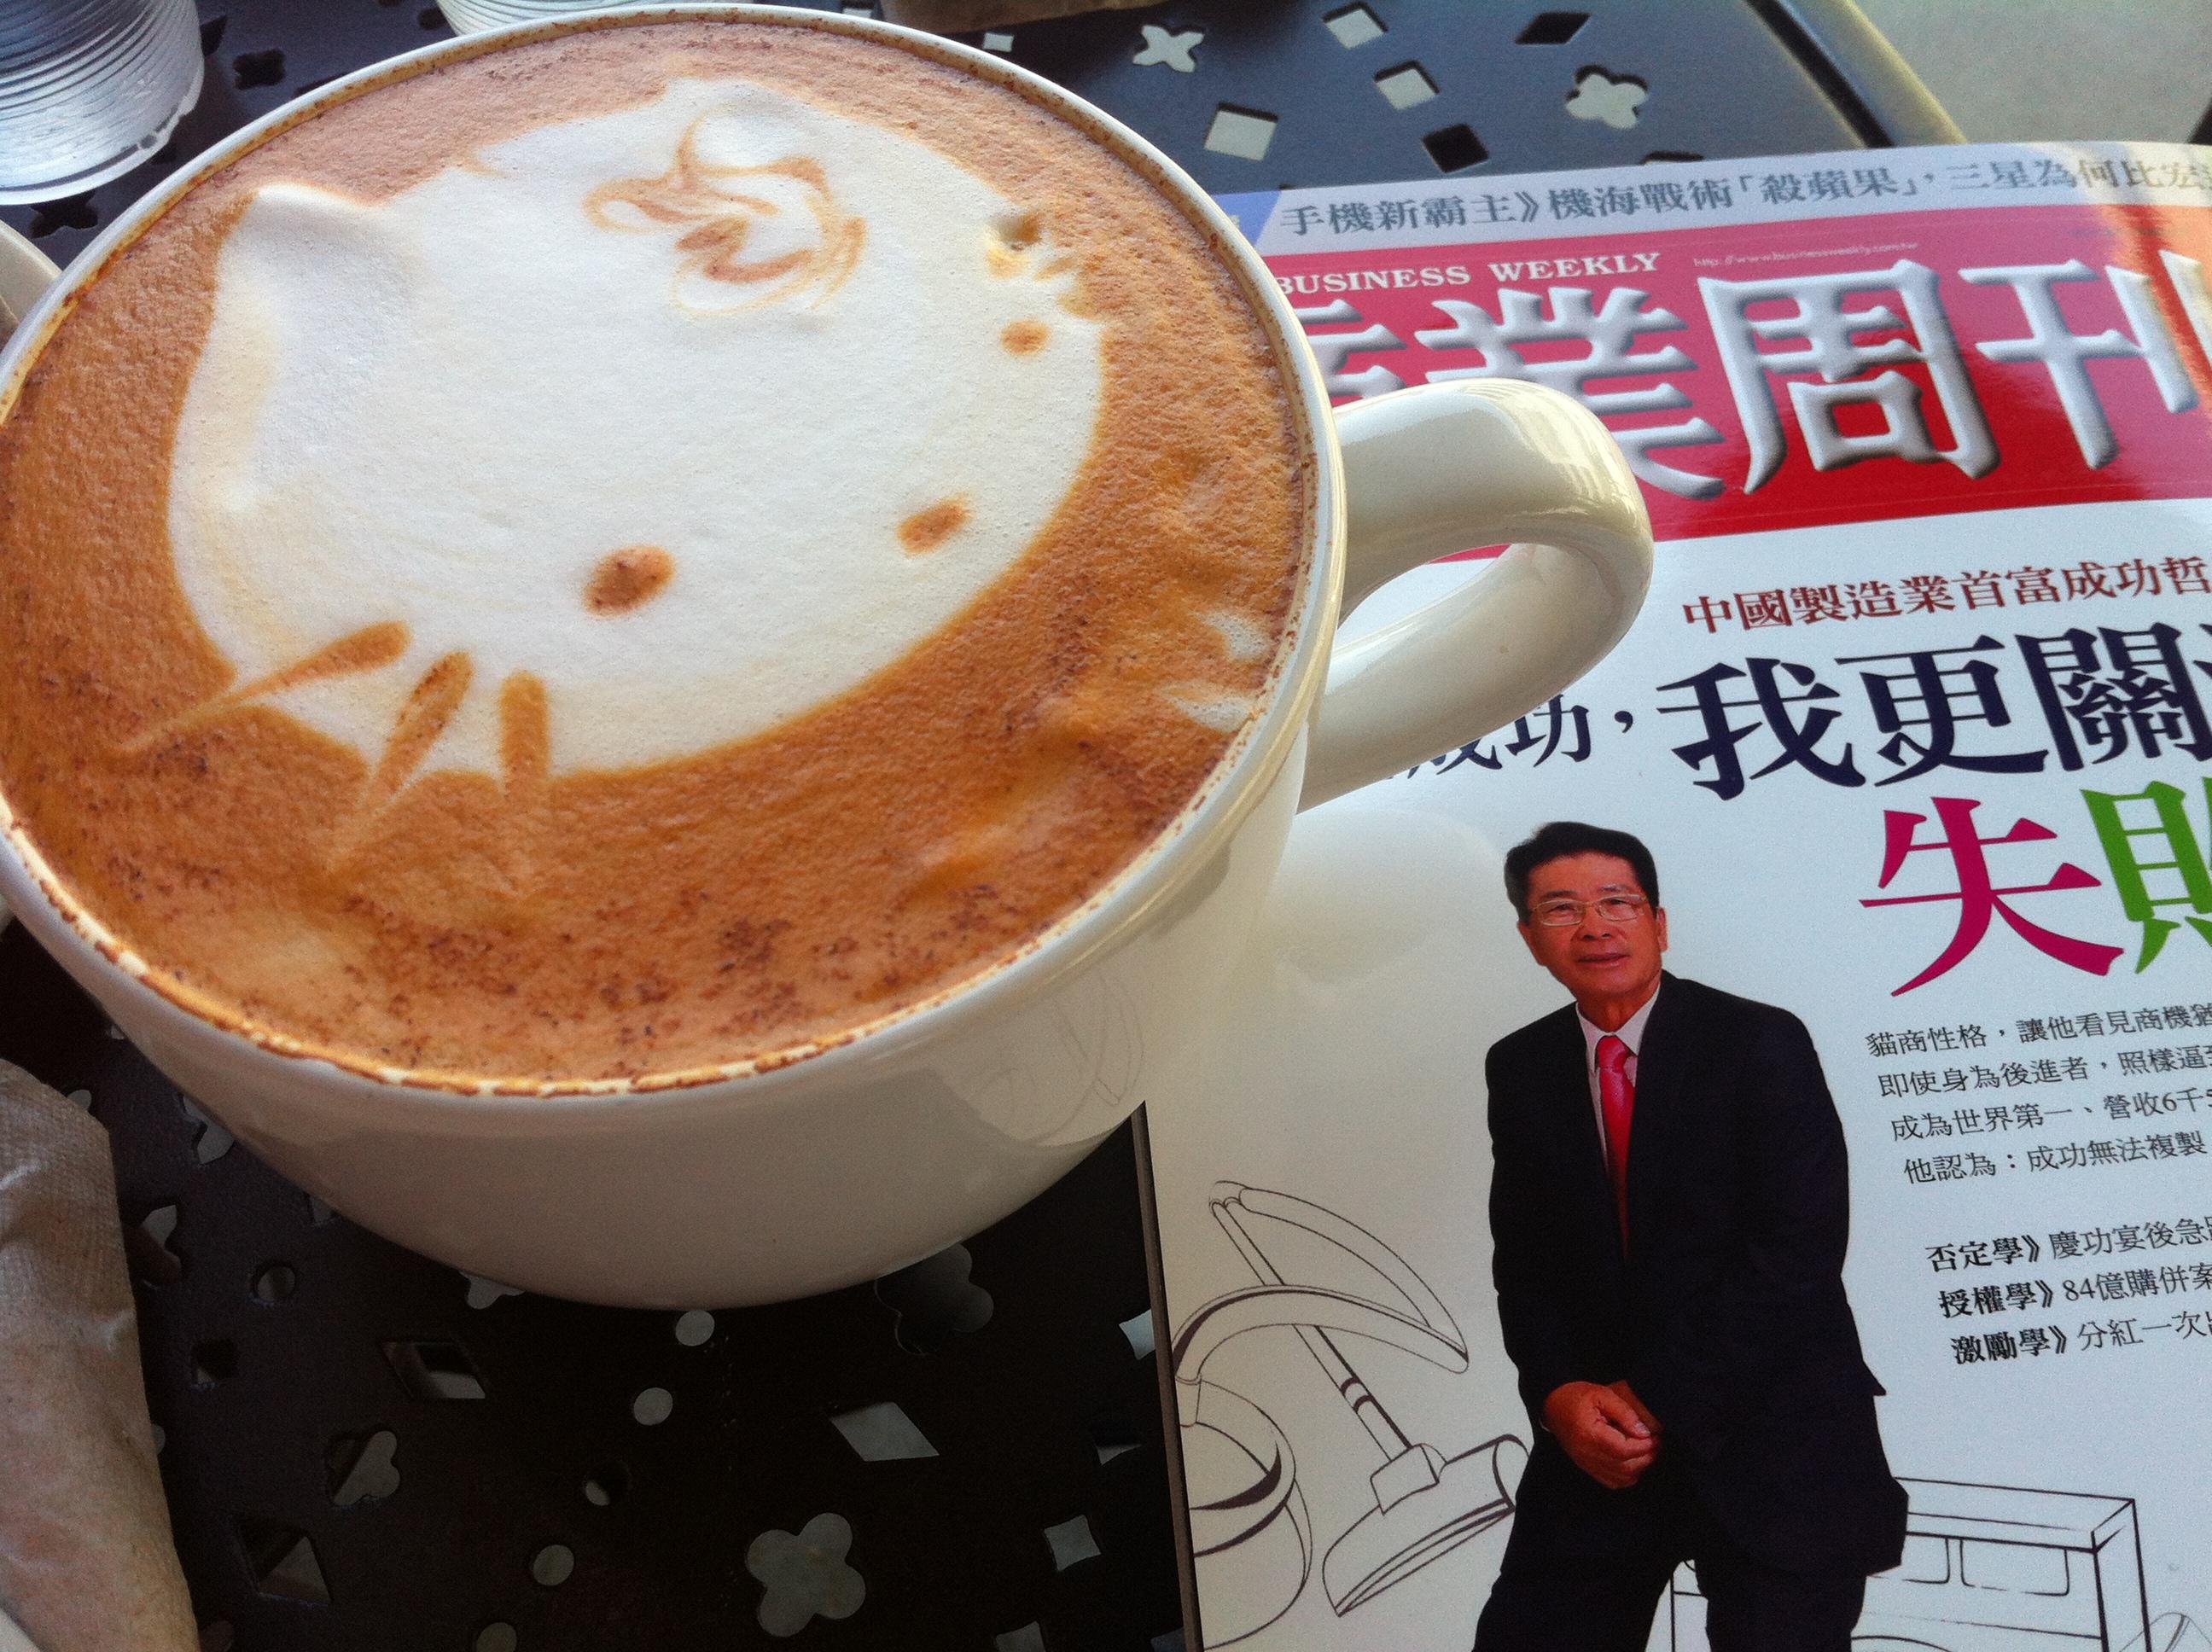 Urth Caffe | DTLA